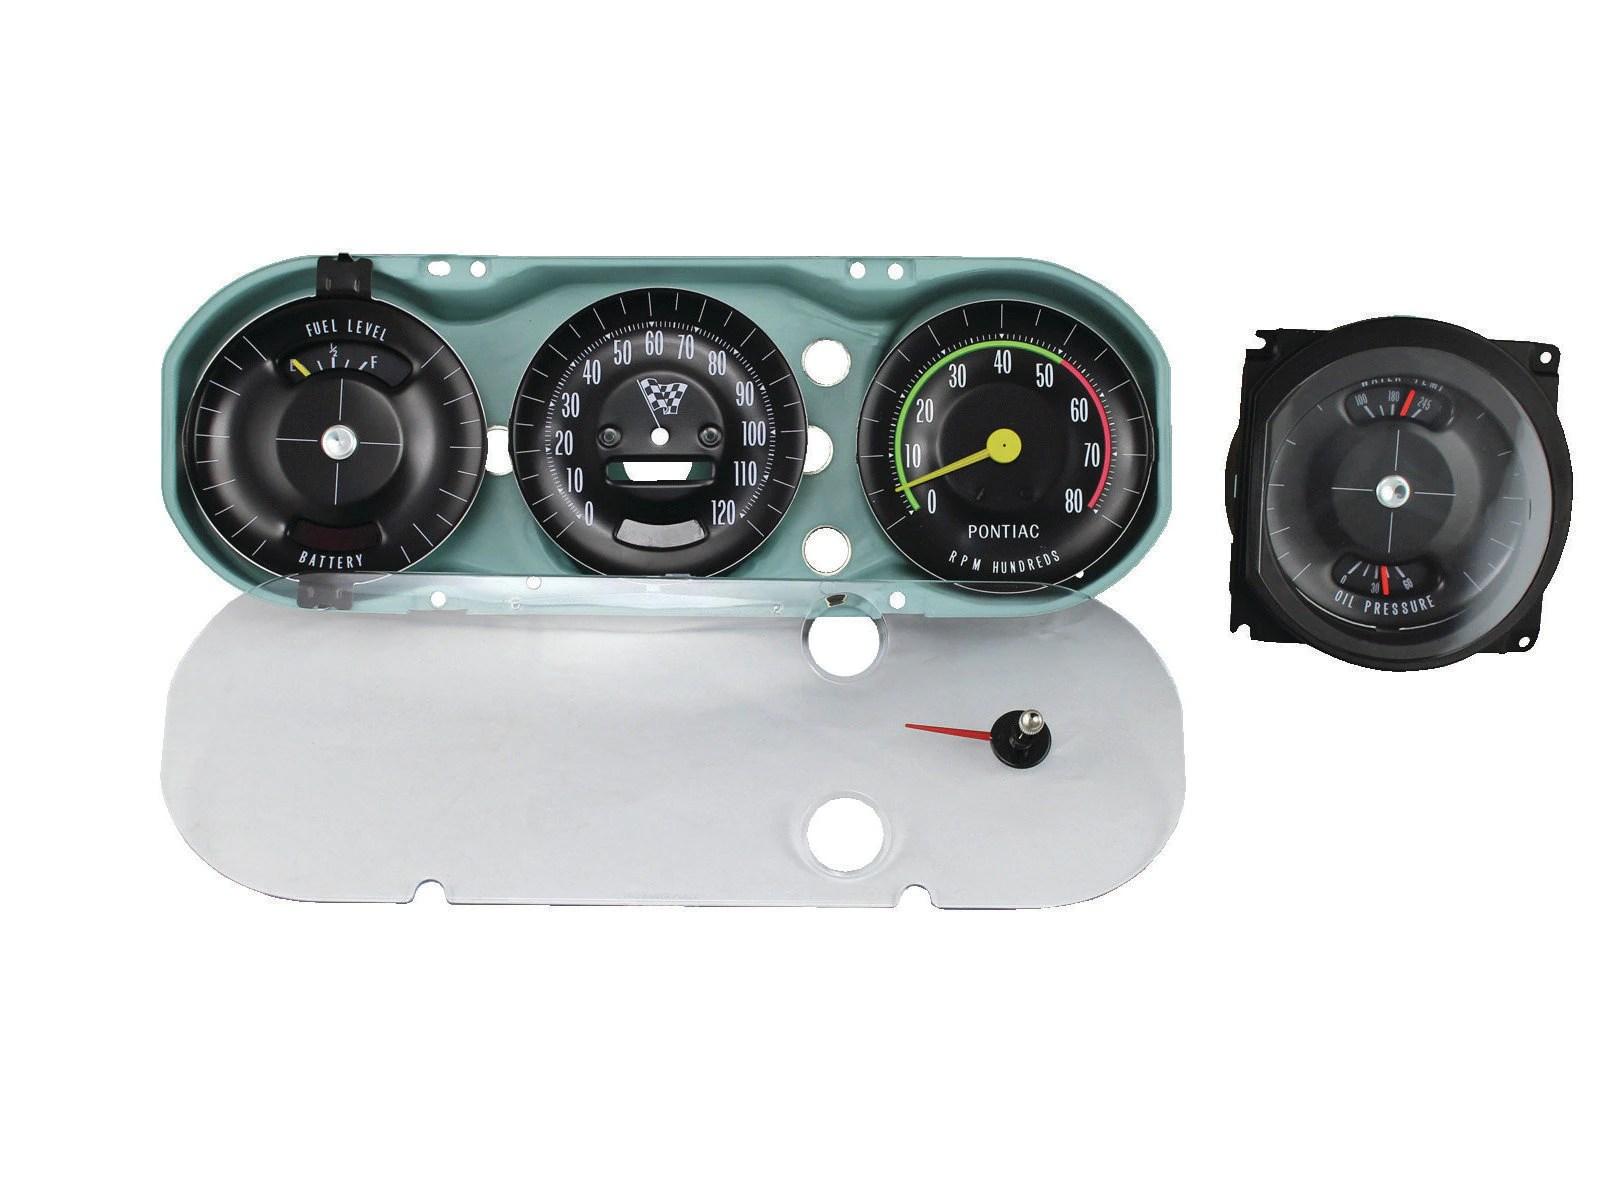 medium resolution of 1965 gto rally gauges wiring diagram diagram database reg mix 1965 gto rally gauges wiring diagram 1967